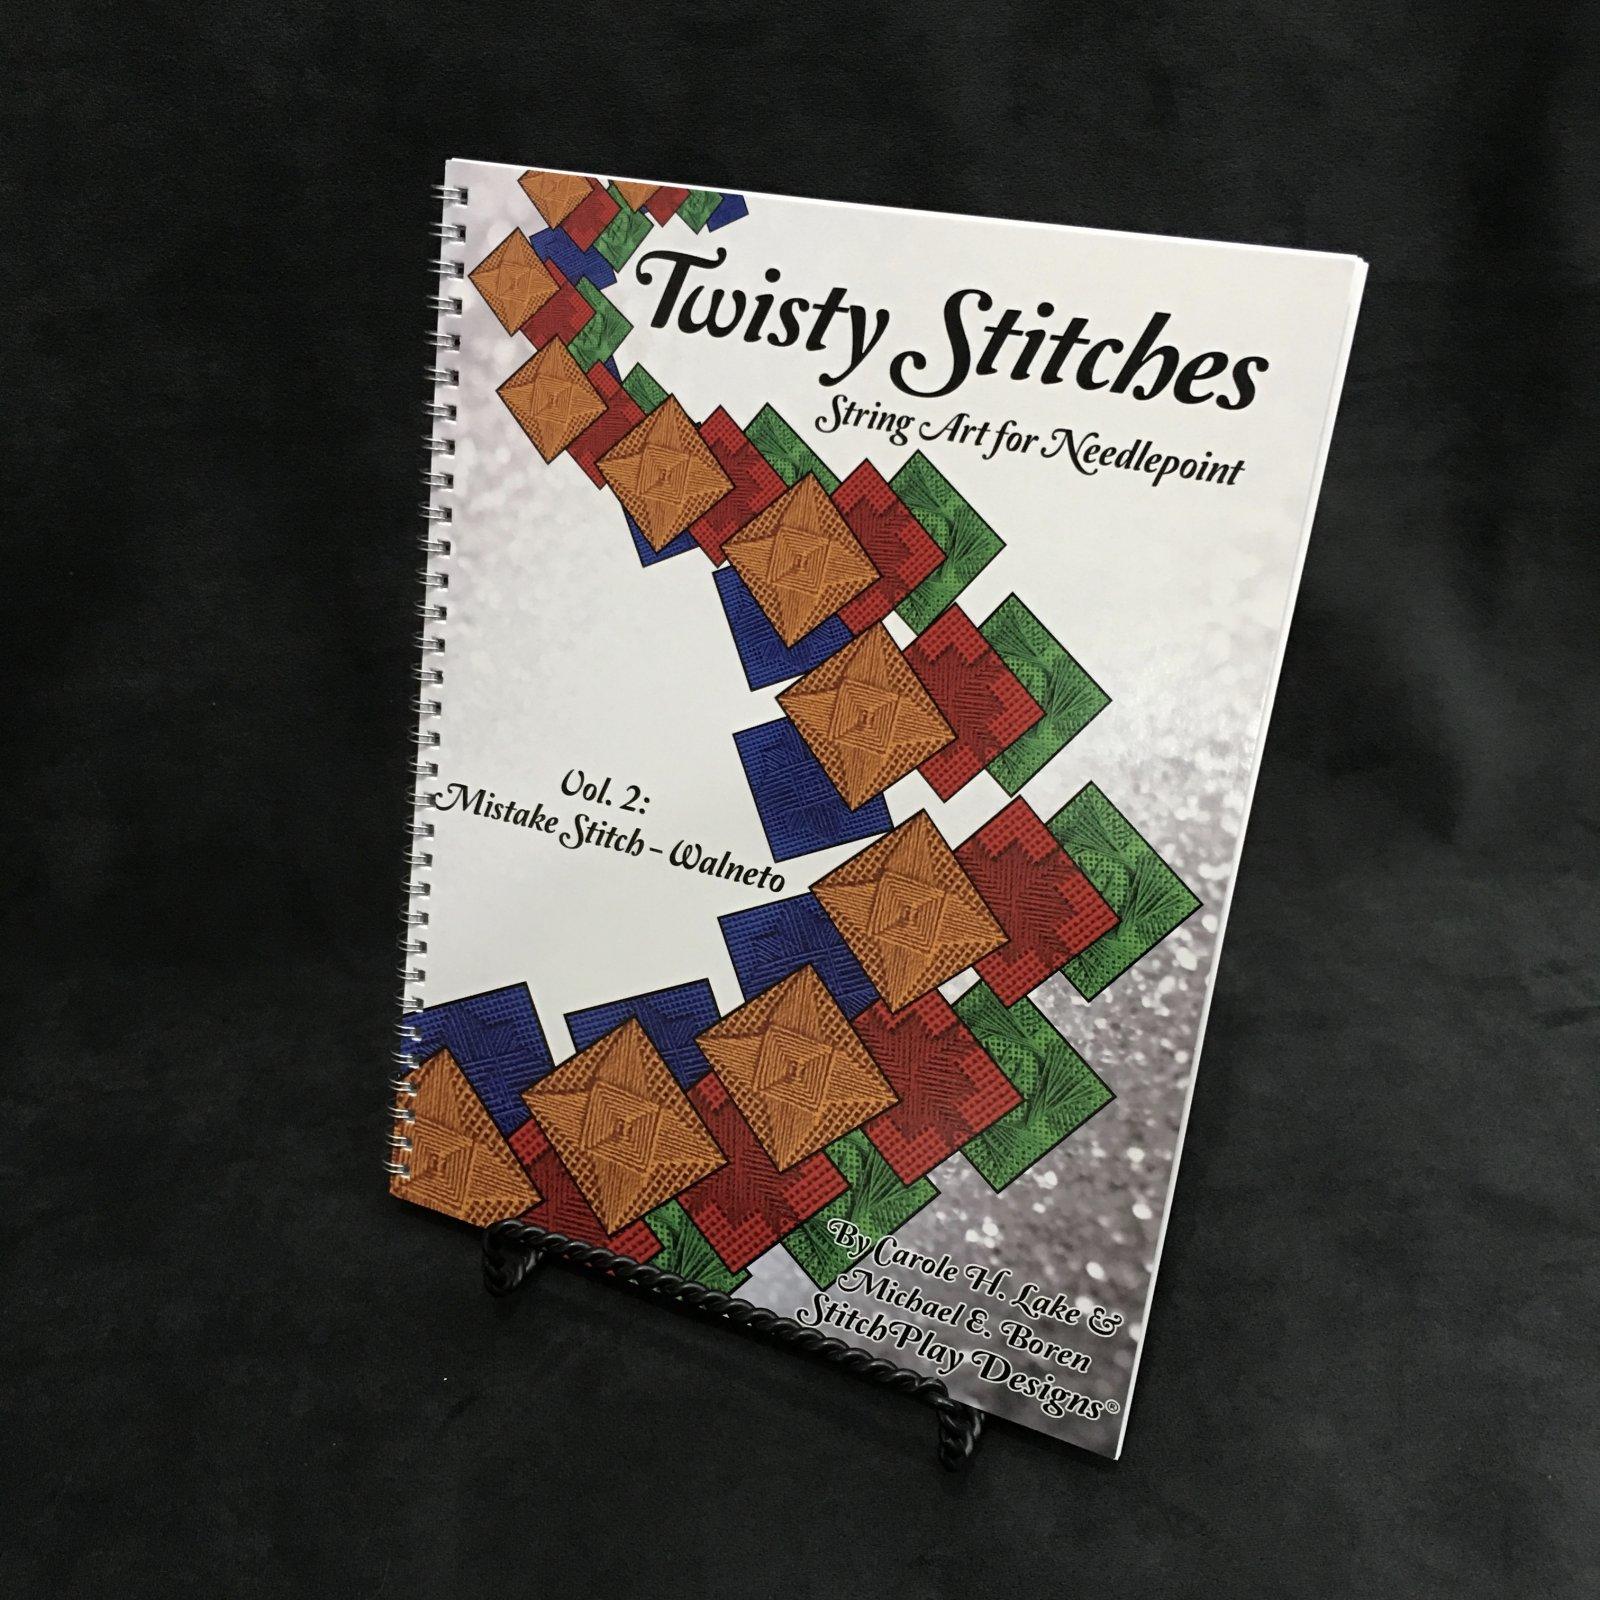 Twisty Stitches Book, Vol 2